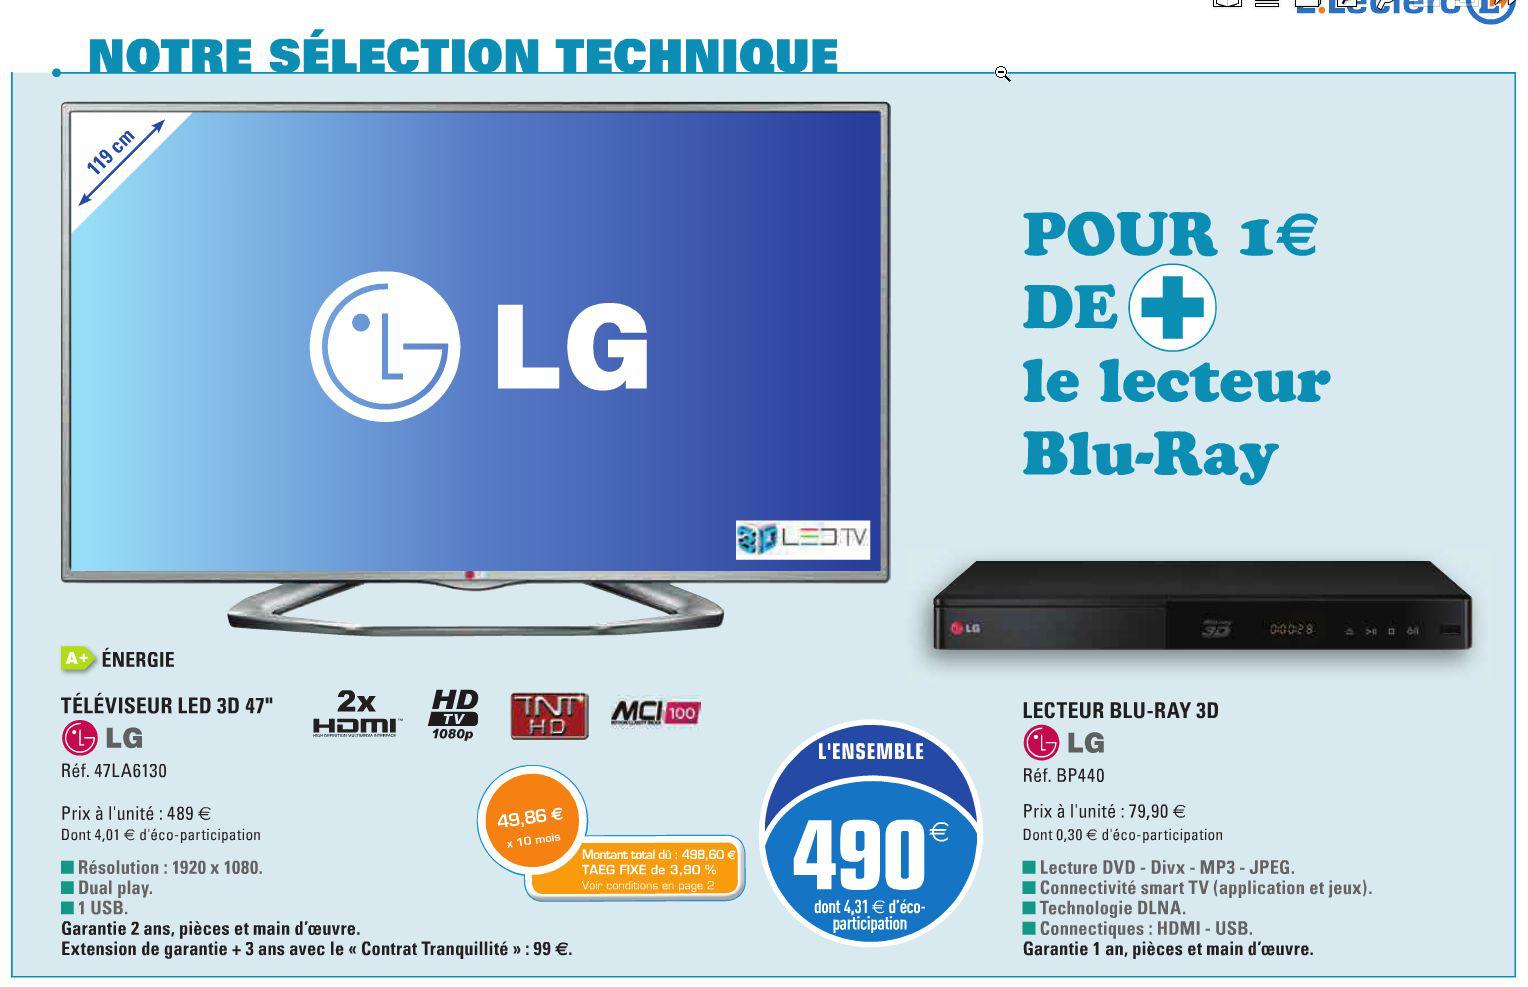 "EnsembleTéléviseur LG 47LA6130 (47"") + lecteur Blu Ray LG BP440"